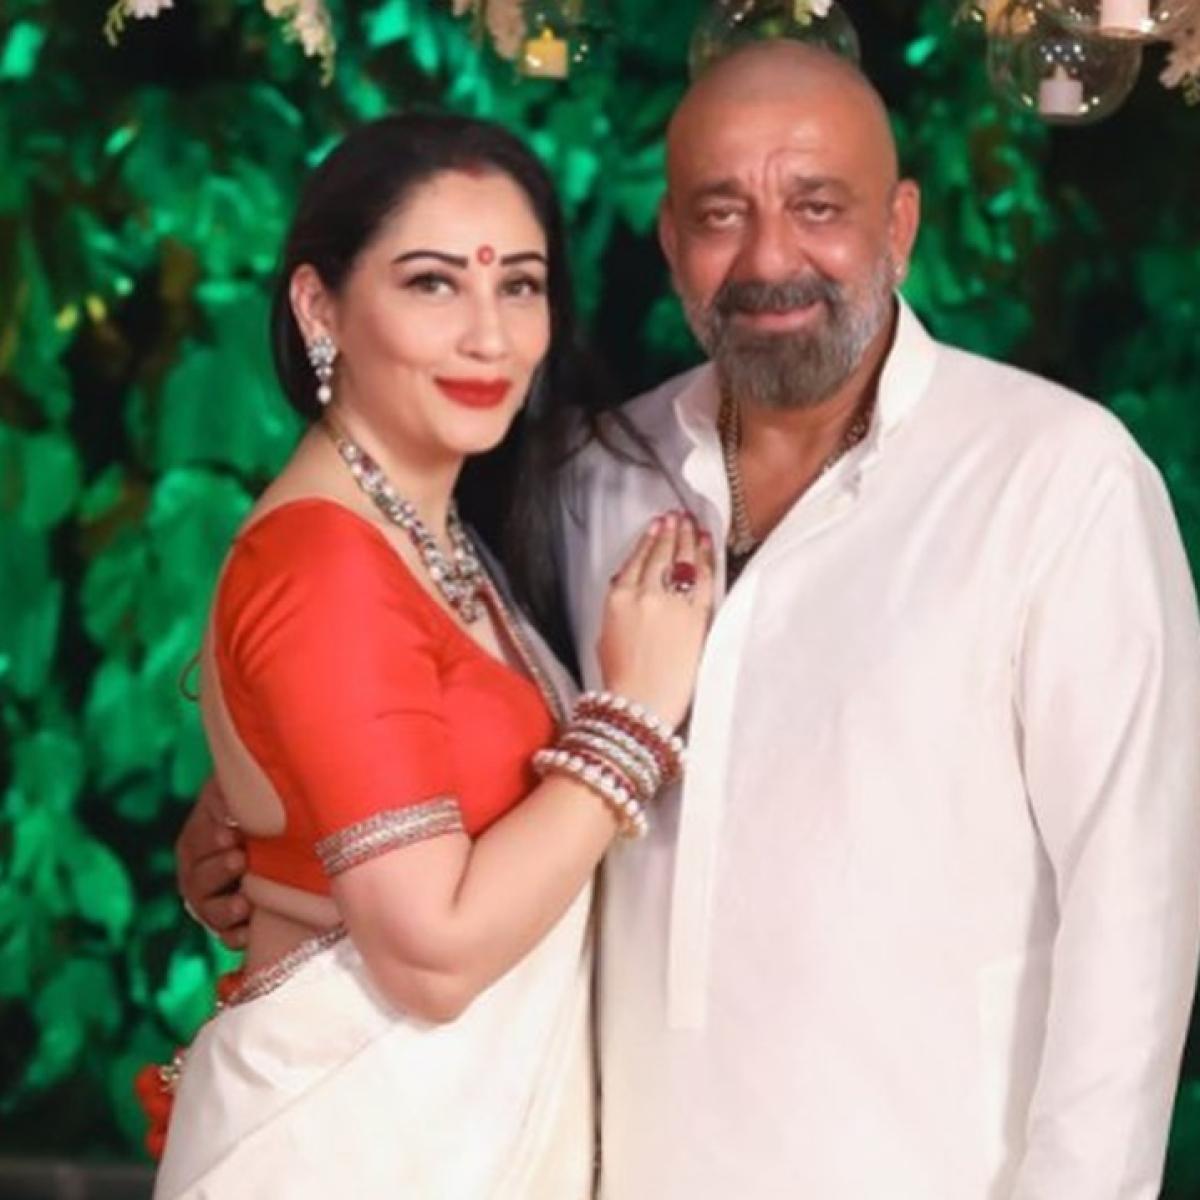 'Sanjay to get initial treatment at Mumbai's Kokilaben Hospital': Maanayata Dutt